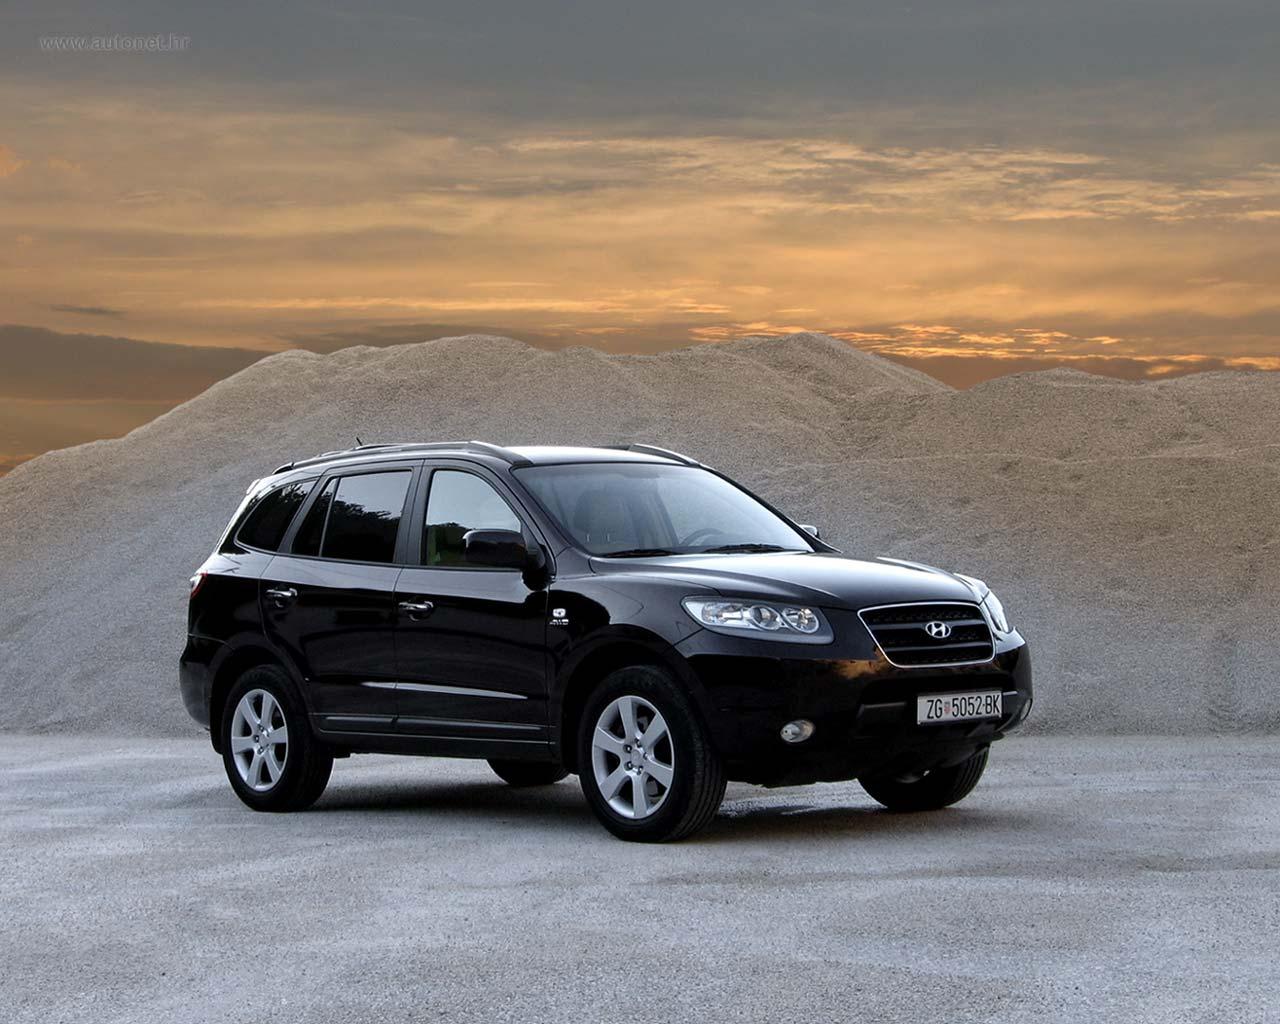 http://2.bp.blogspot.com/-x_d0cNf4IgY/Toxf2eP1skI/AAAAAAAAAvk/MjqTx84w8Mc/s1600/Hyundai-Santa-Fe-2.jpg